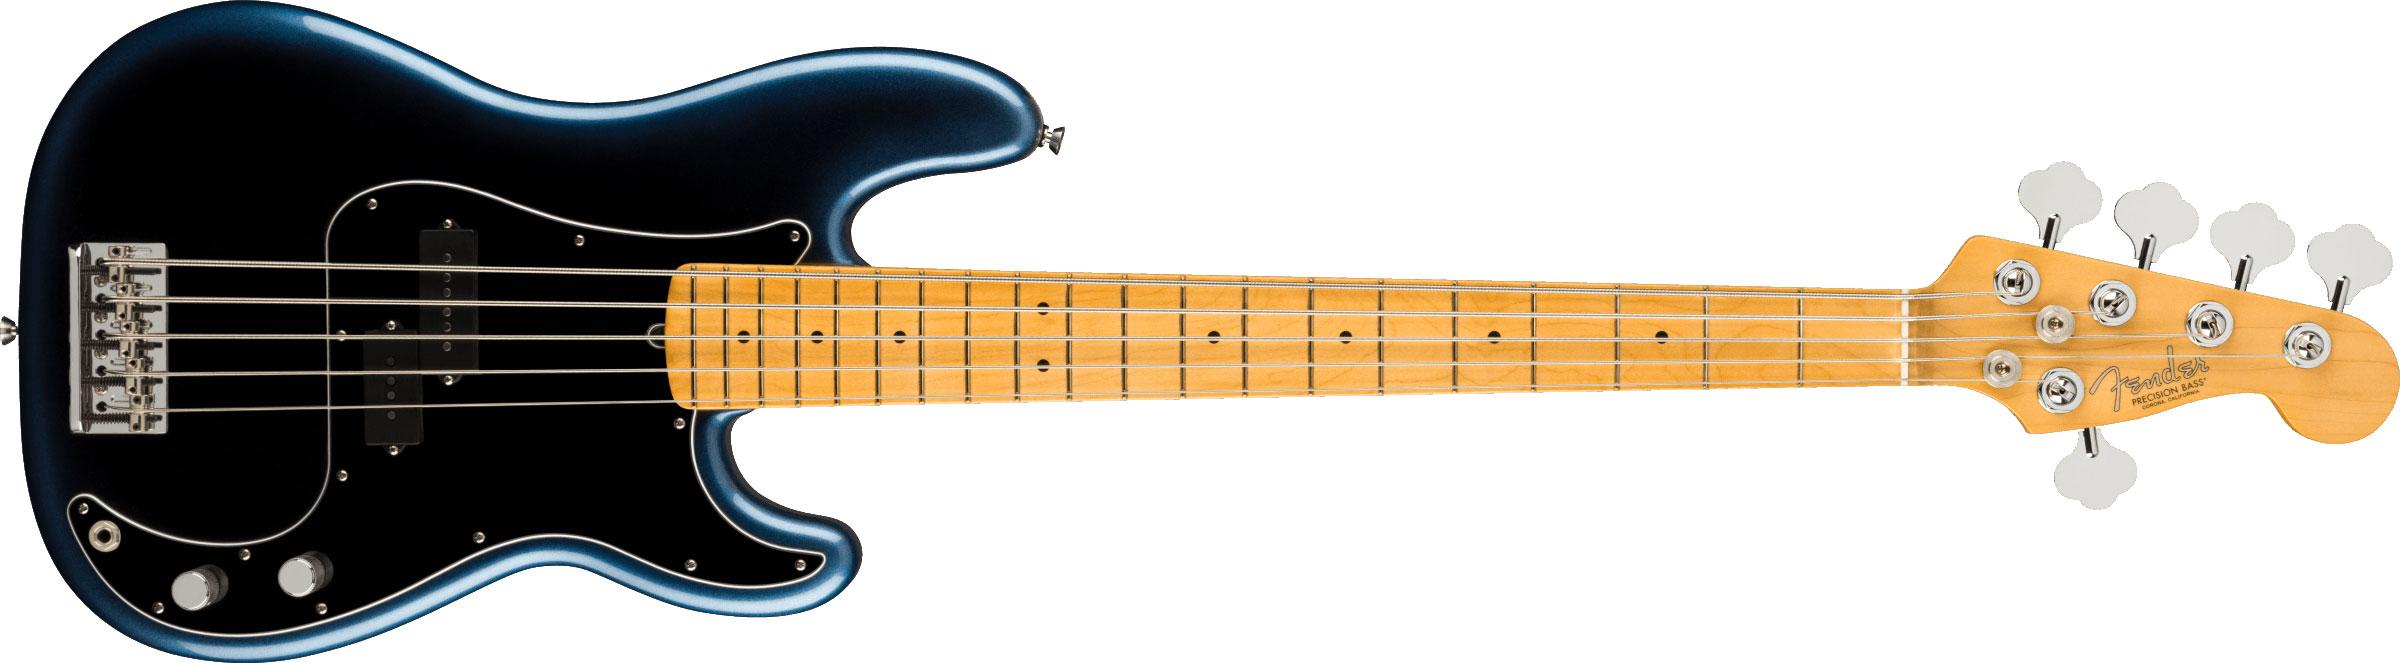 American Professional II Precision Bass V (2020-) 画像1